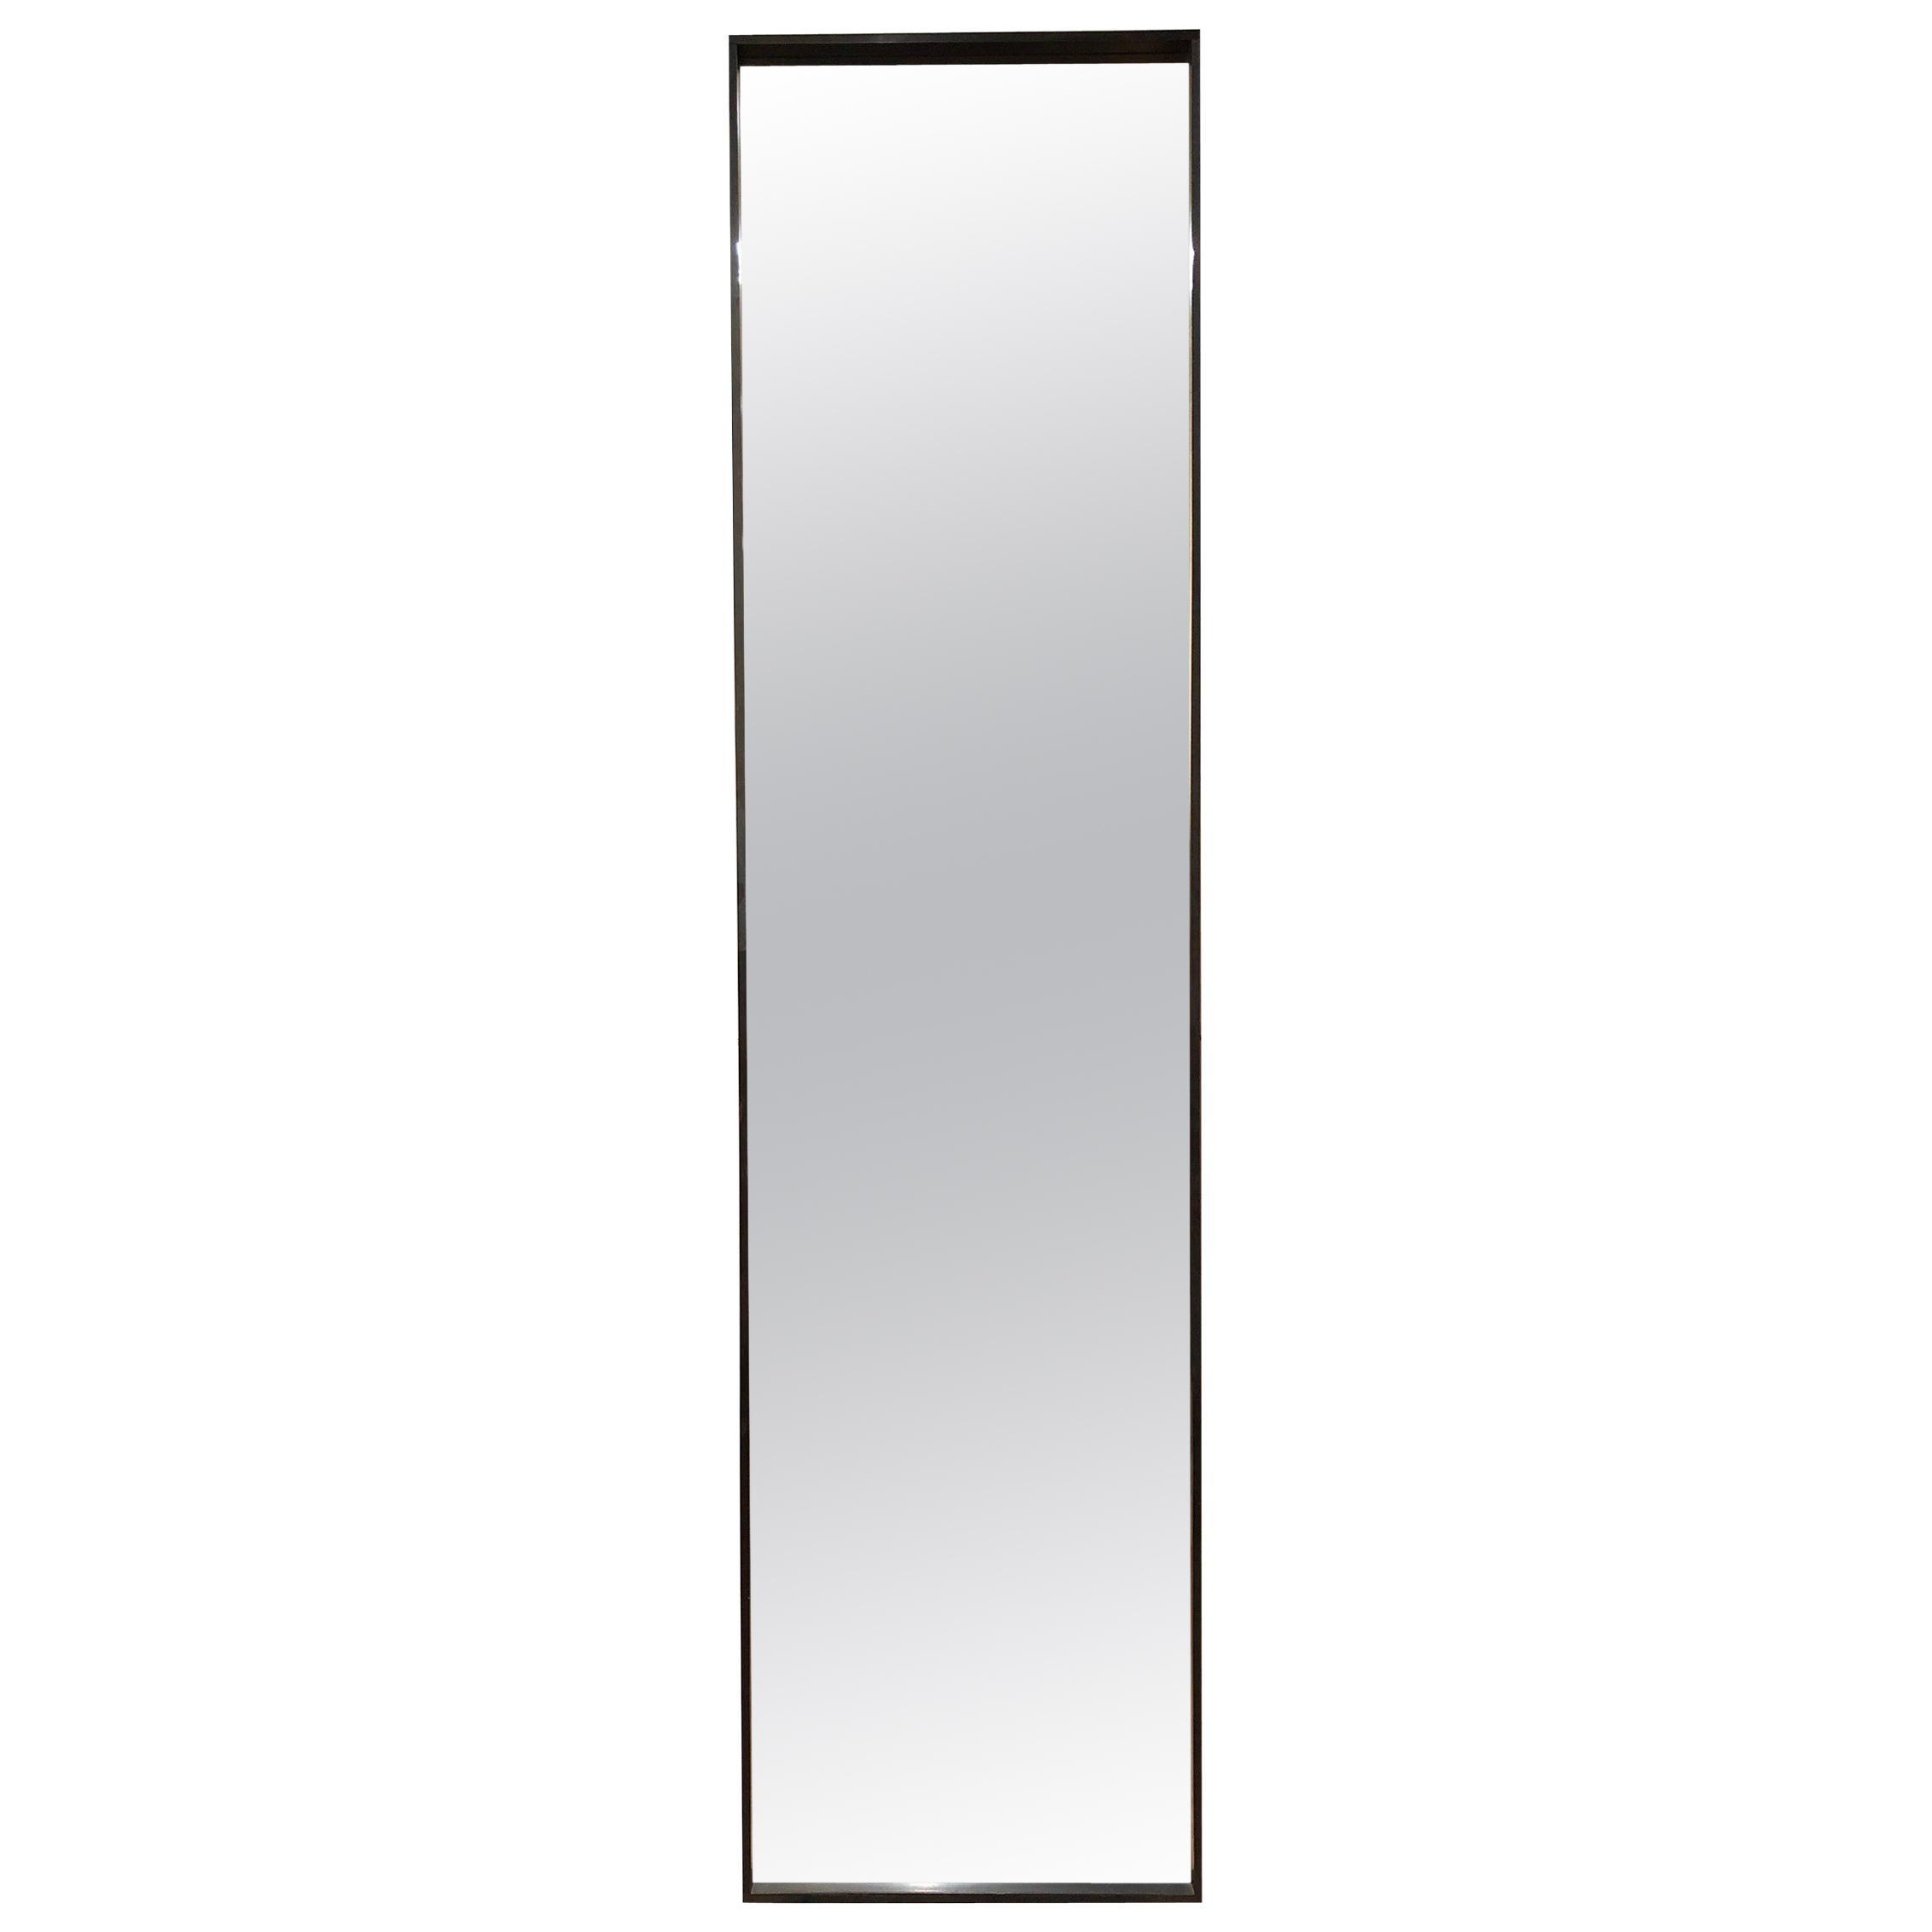 WYETH Original Rectangular Mirror in Blackened Bronze